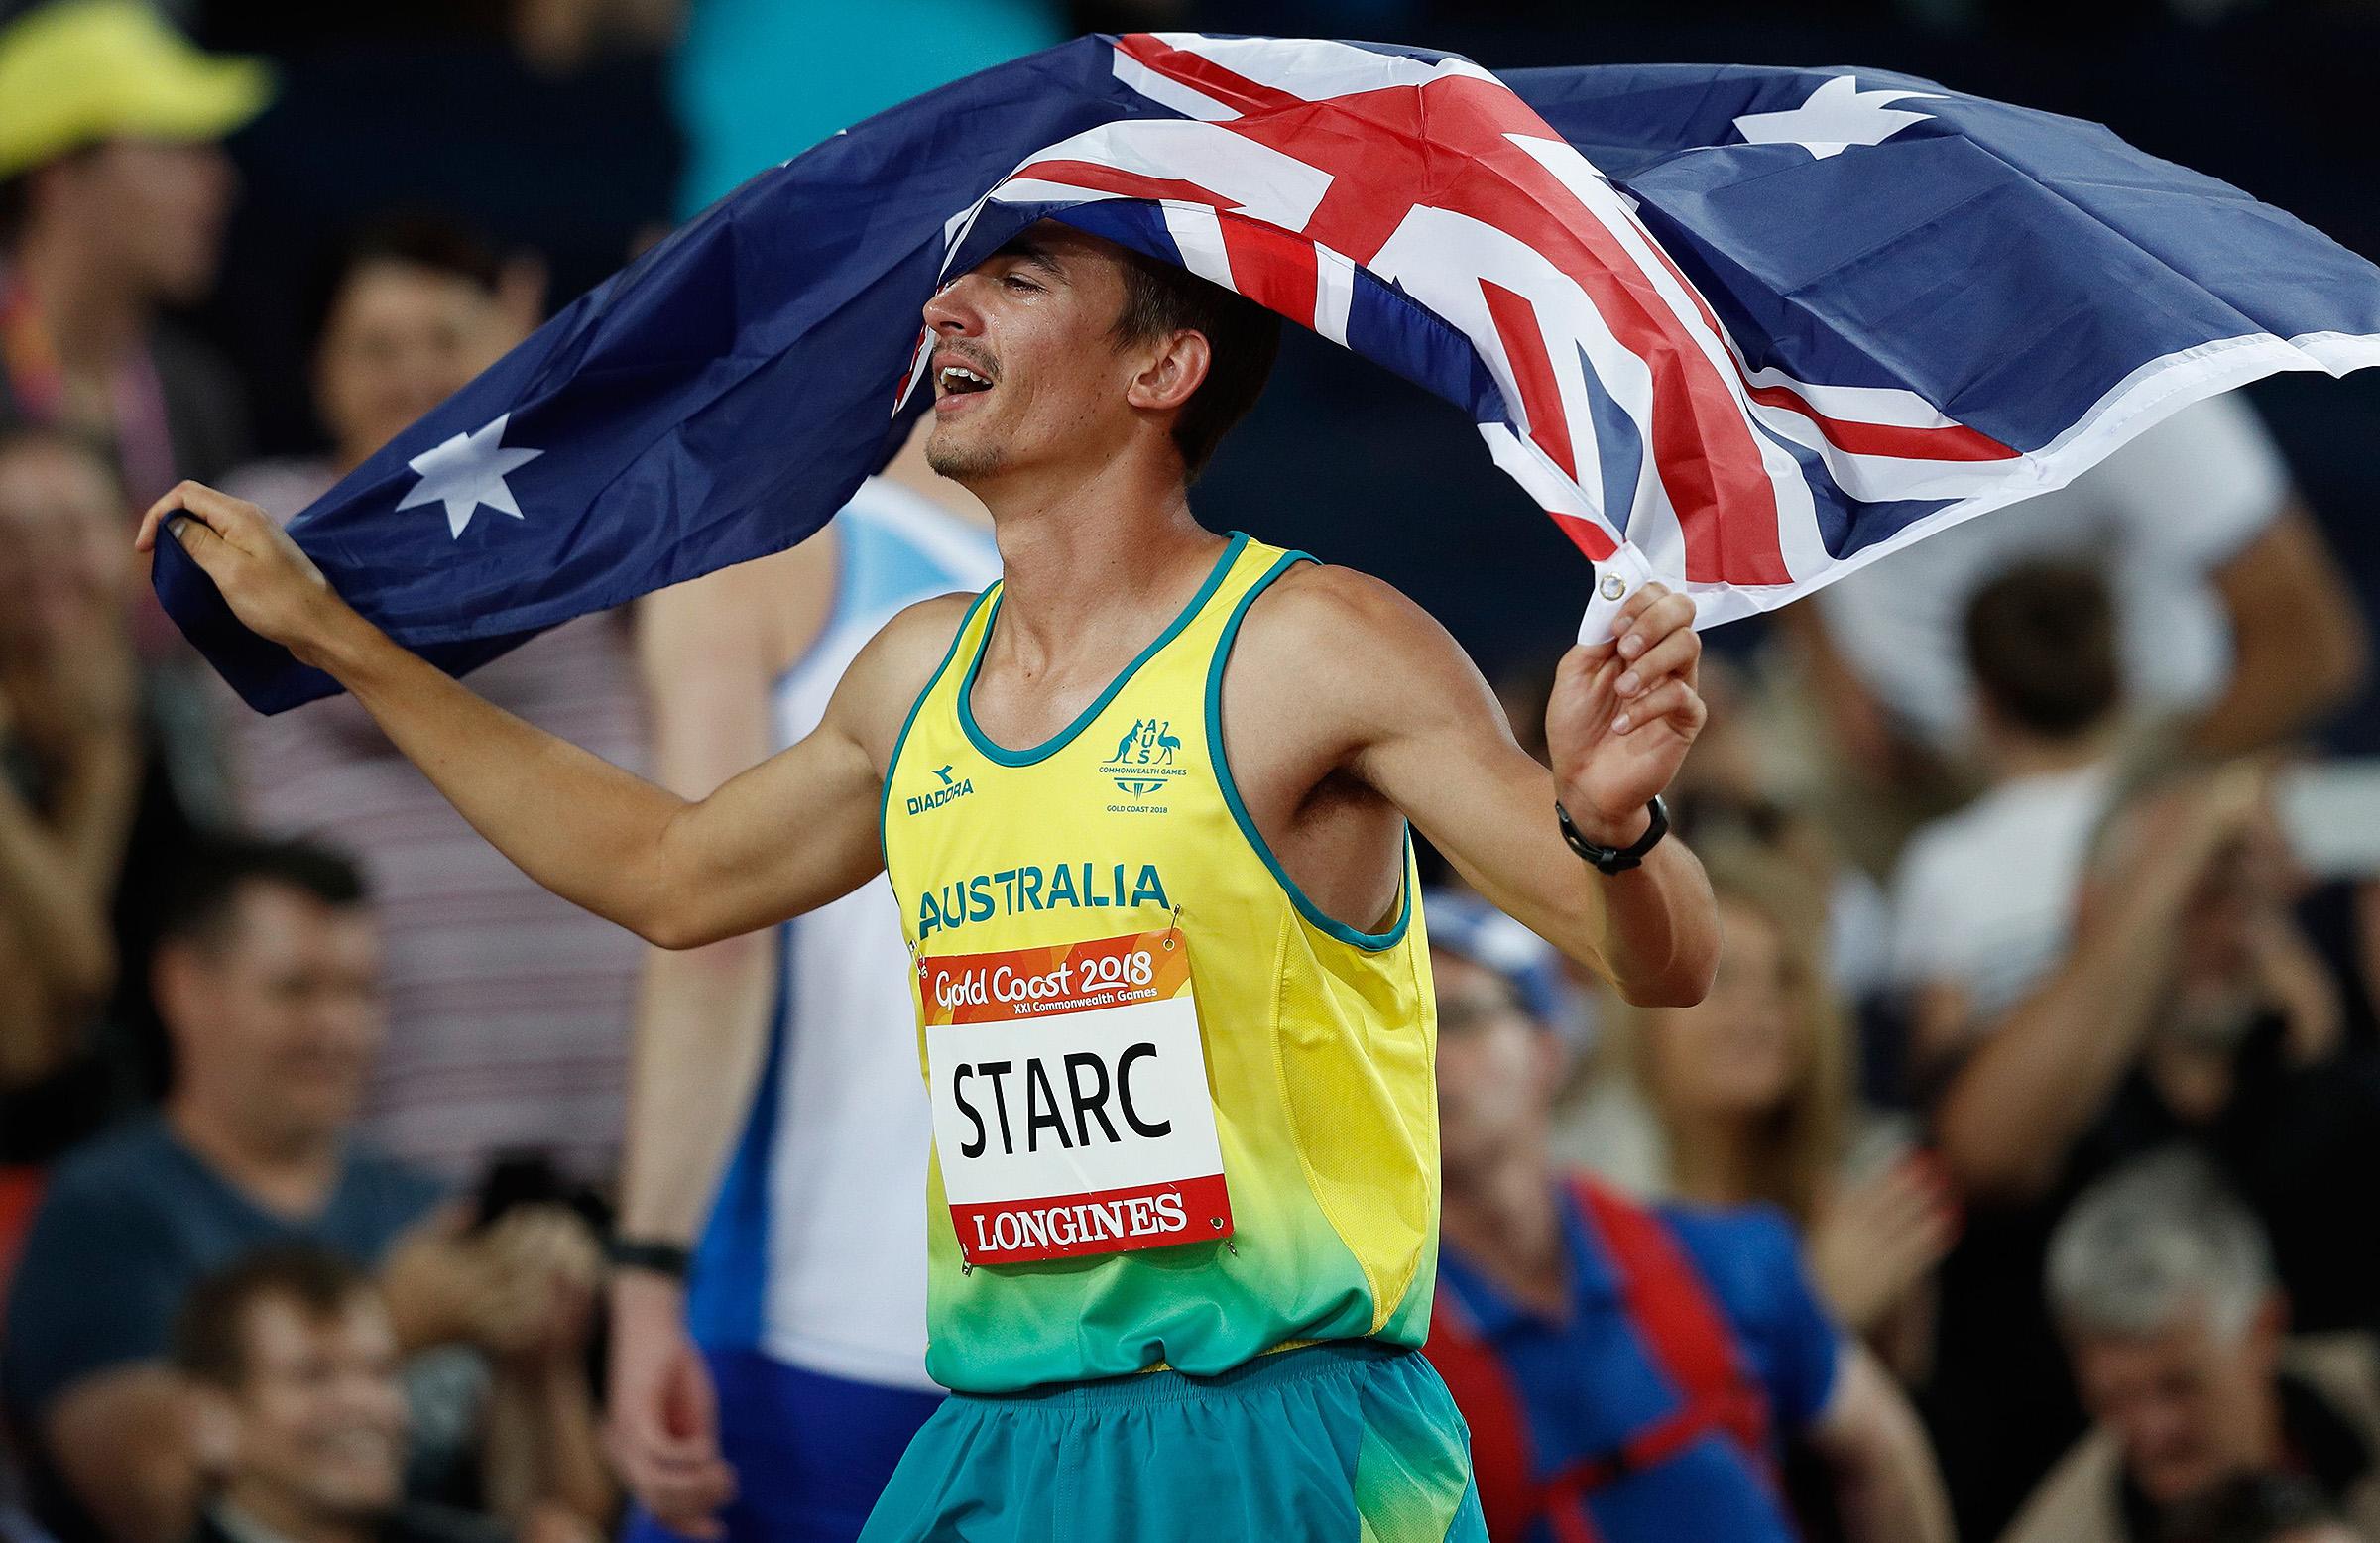 Brandon Starc celebrates his gold medal on Wednesday night // Getty